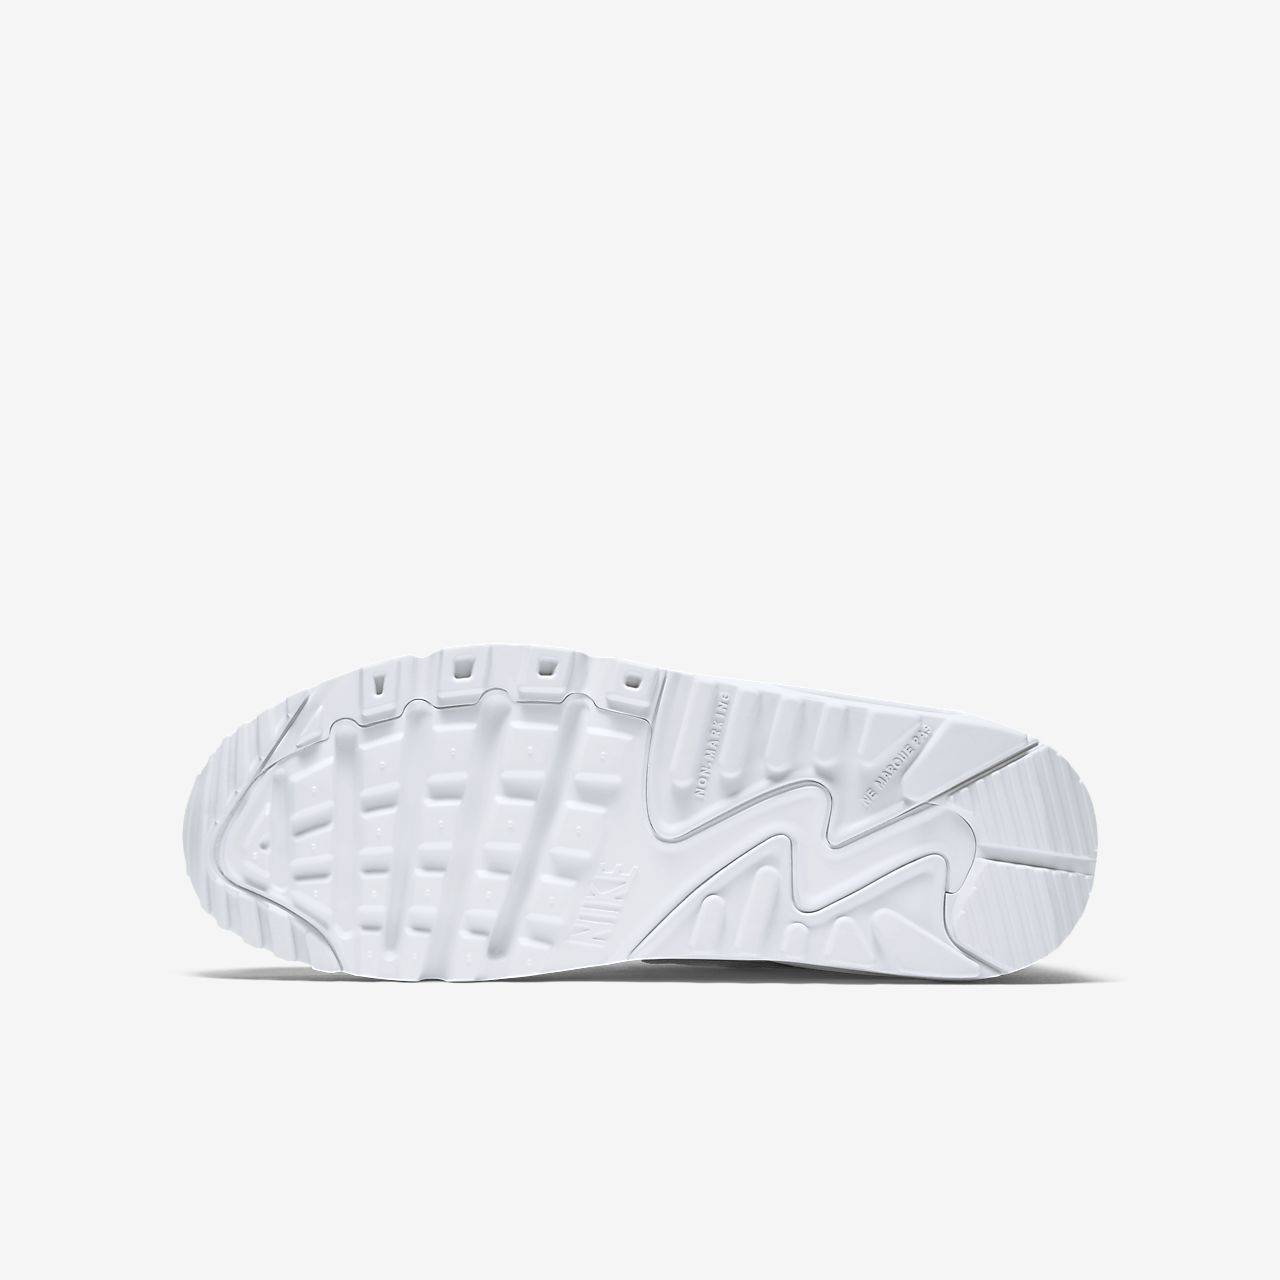 Nike Air Max 90 Leather Scarpa Ragazzi (35.5 40) Bianco